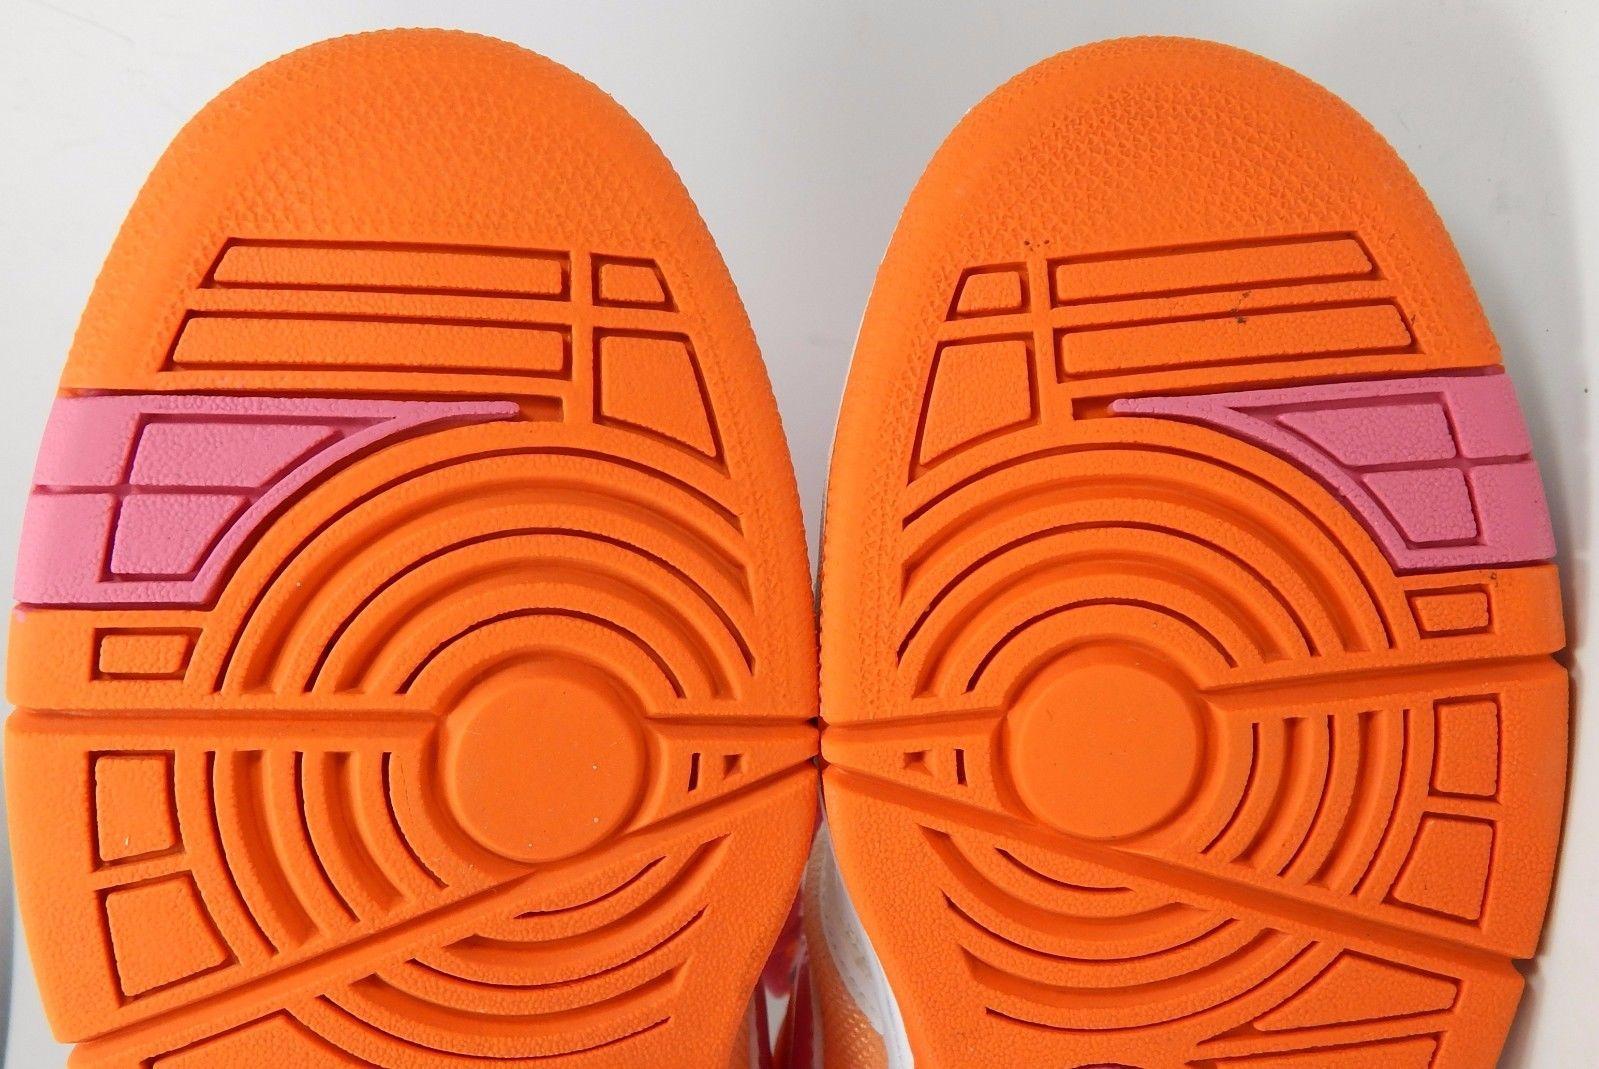 Nike Air Prestige II High Women's Basketball Shoes Sz 9 M (B) EU 40.5 334480-161